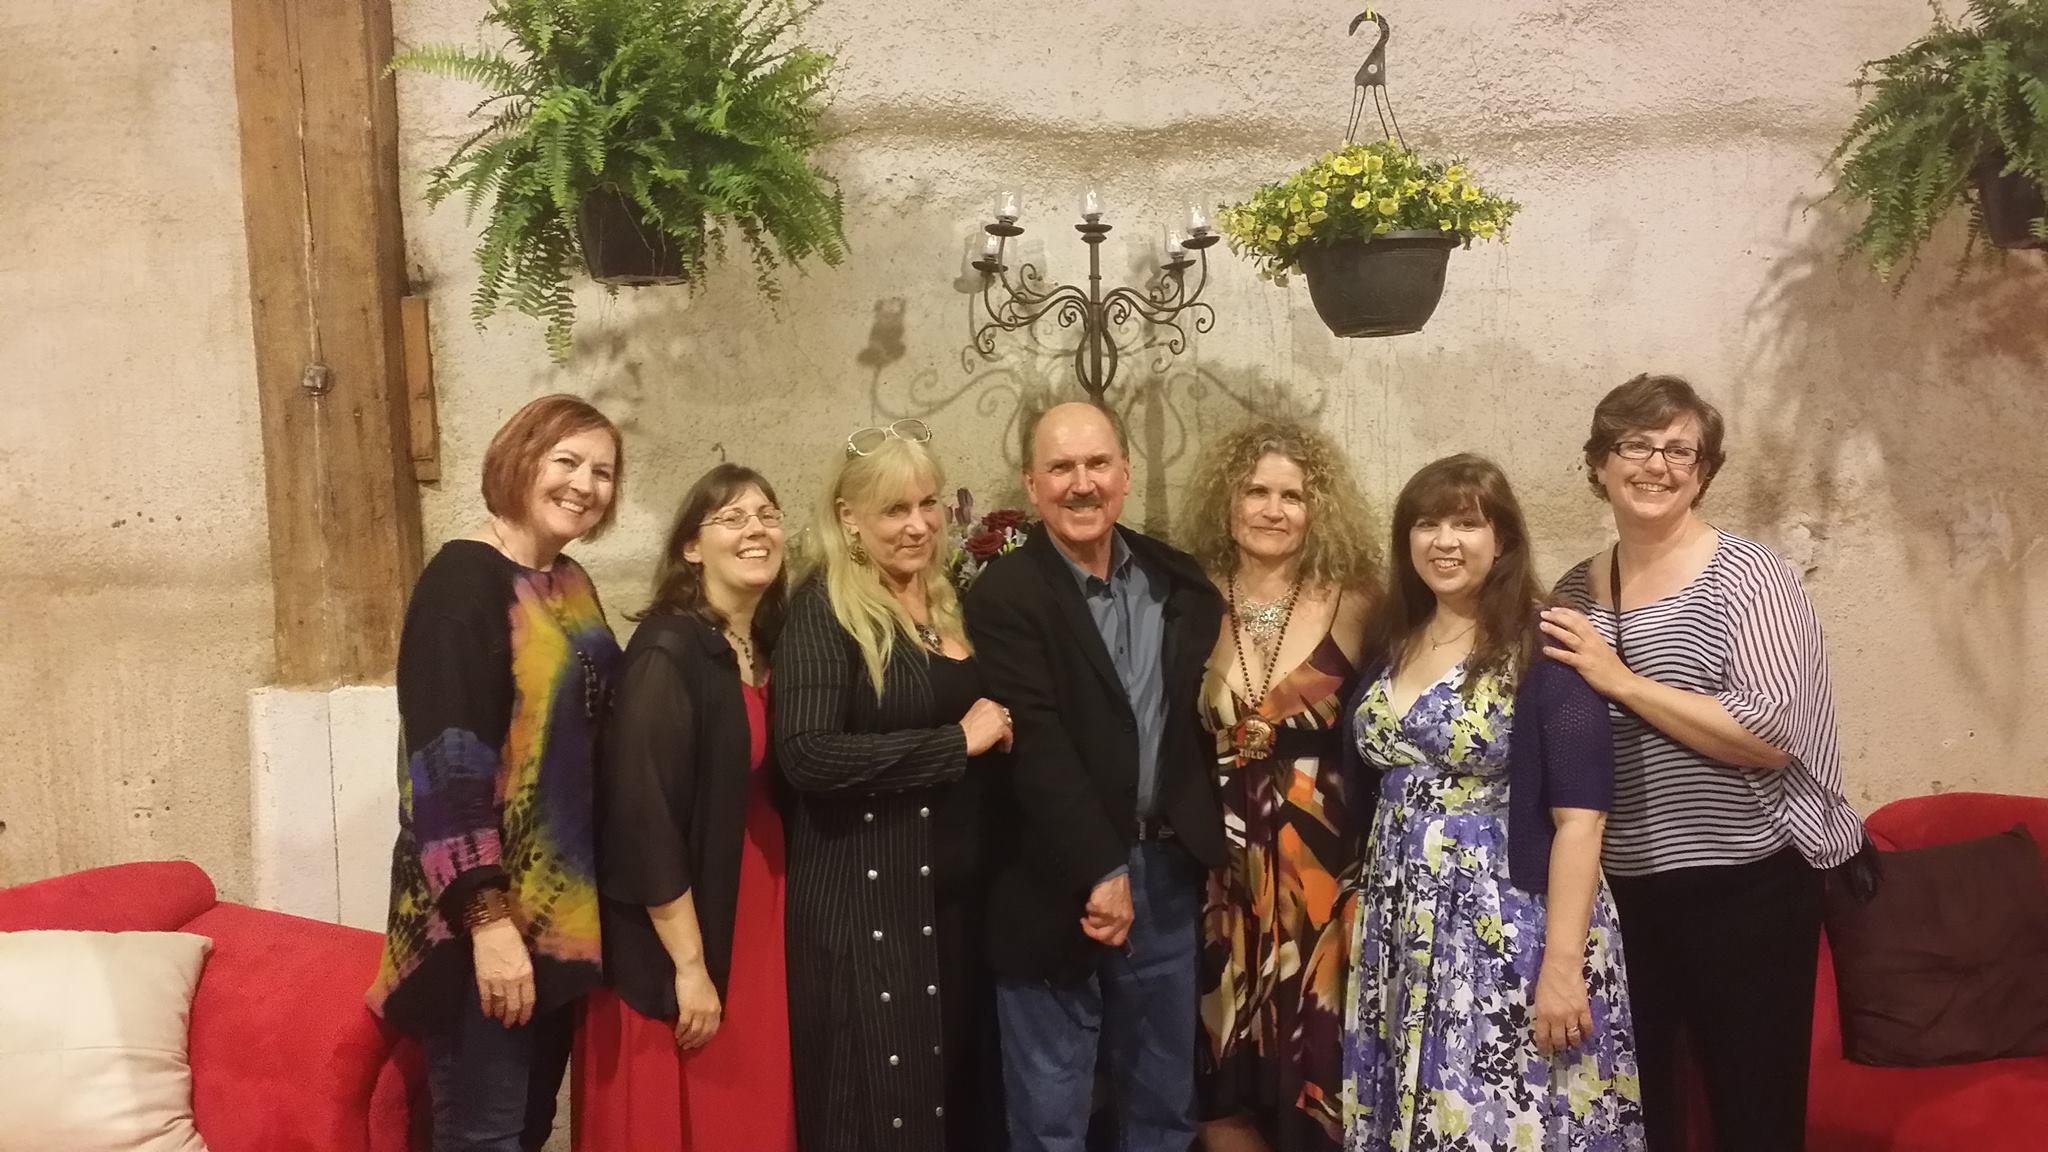 The Sirens of Suspense: Patricia Burroughs, CJ Lyons, Heather Graham, David Morrell, Alexandra Sokoloff, Toni McGee Causey, and me.